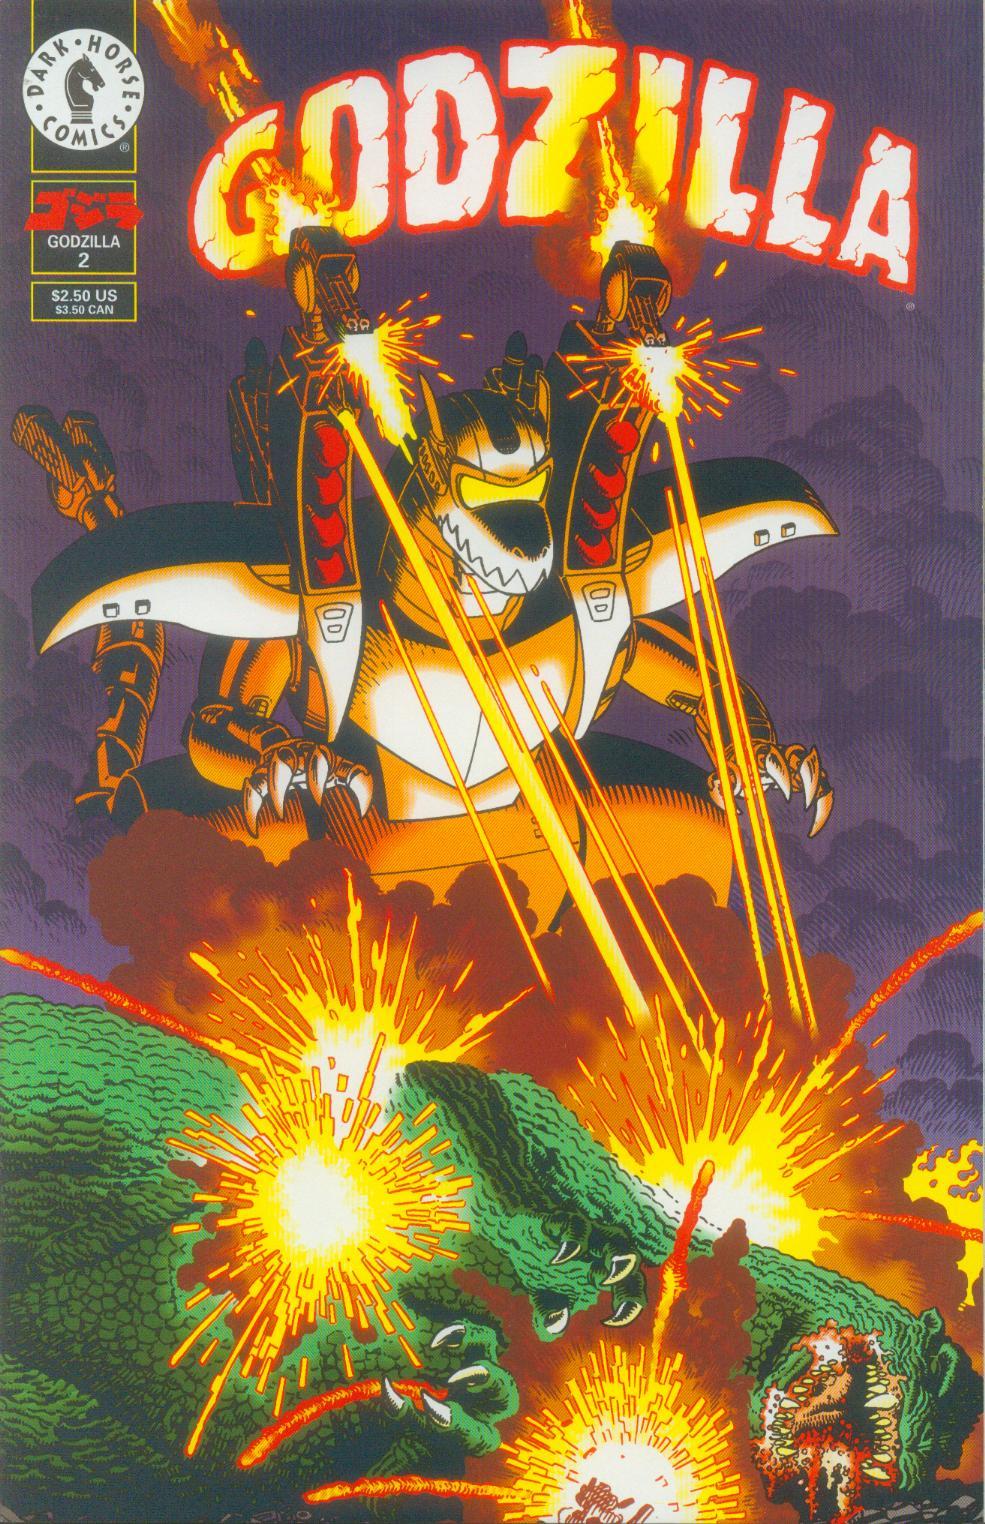 Godzilla (1995) Issue #2 #3 - English 1